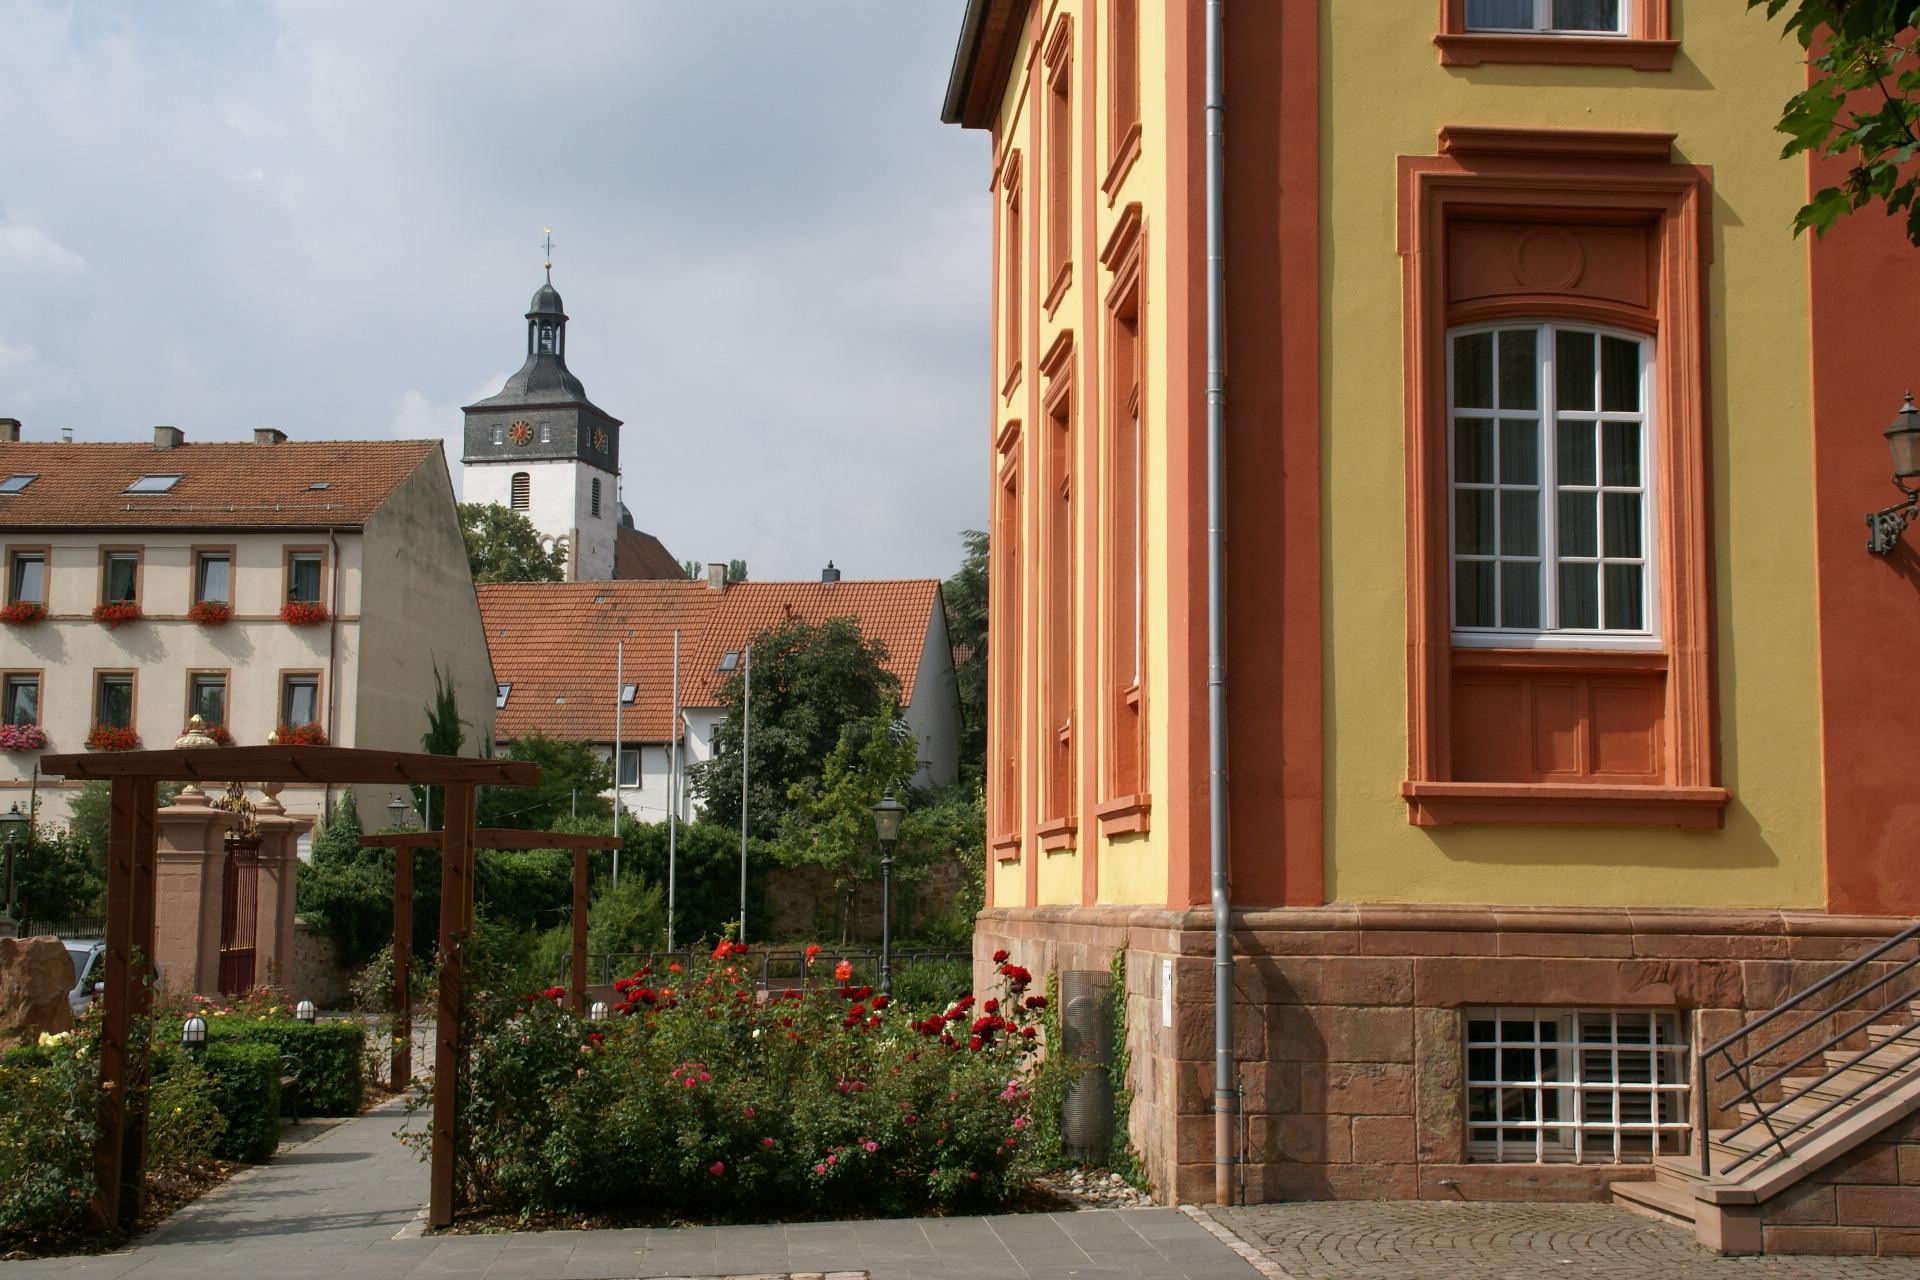 Kirchheimbolanden Germany  City pictures : ... :2009.08.14.103817 Schloss Kirchheimbolanden Wikimedia Commons